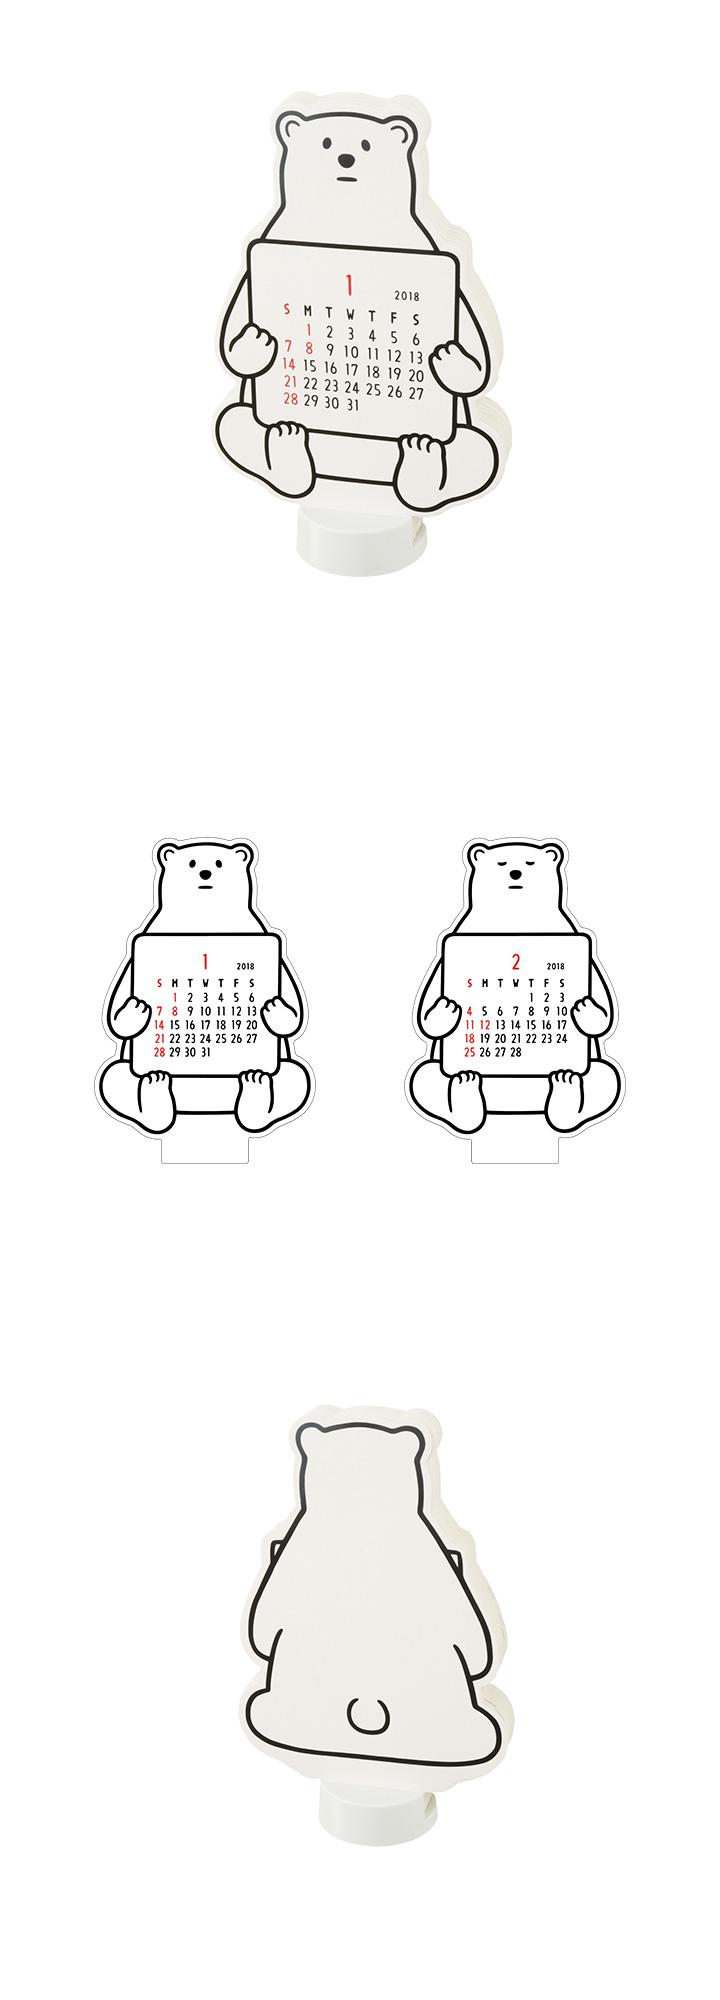 2018 Noritake ダイカットカレンダー クマ